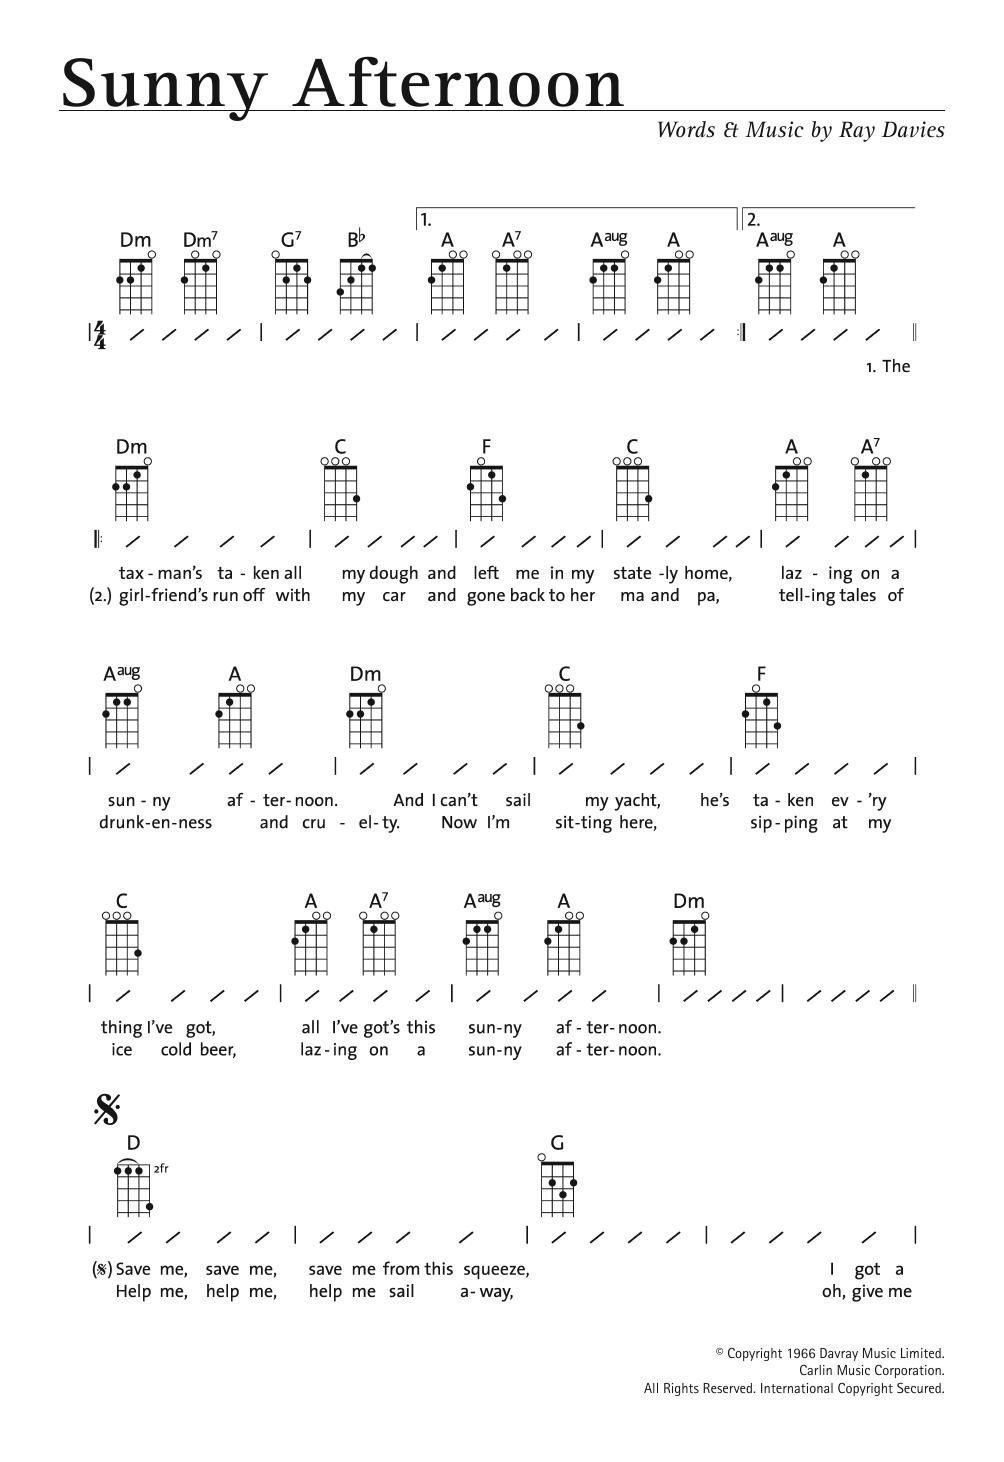 Sunny Afternoon Sheet Music The Kinks Ukulele With Strumming